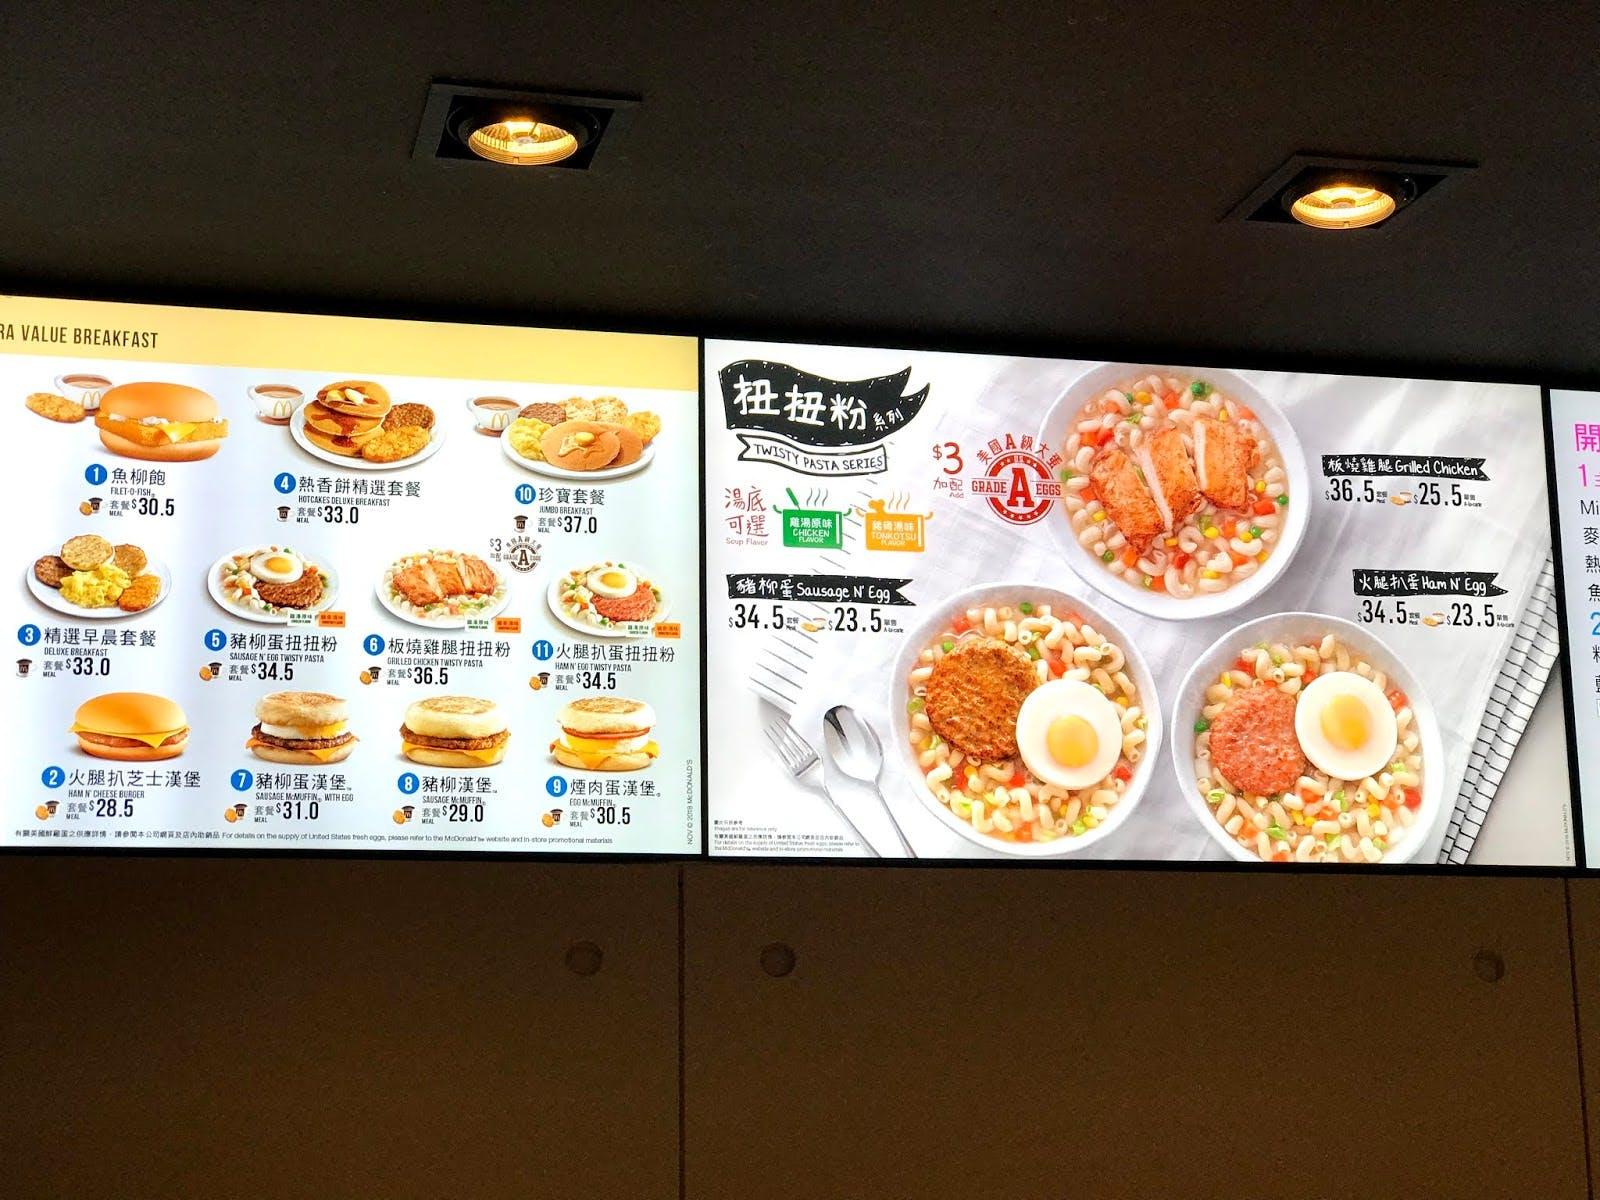 Hong Kong mcdonald's breakfast